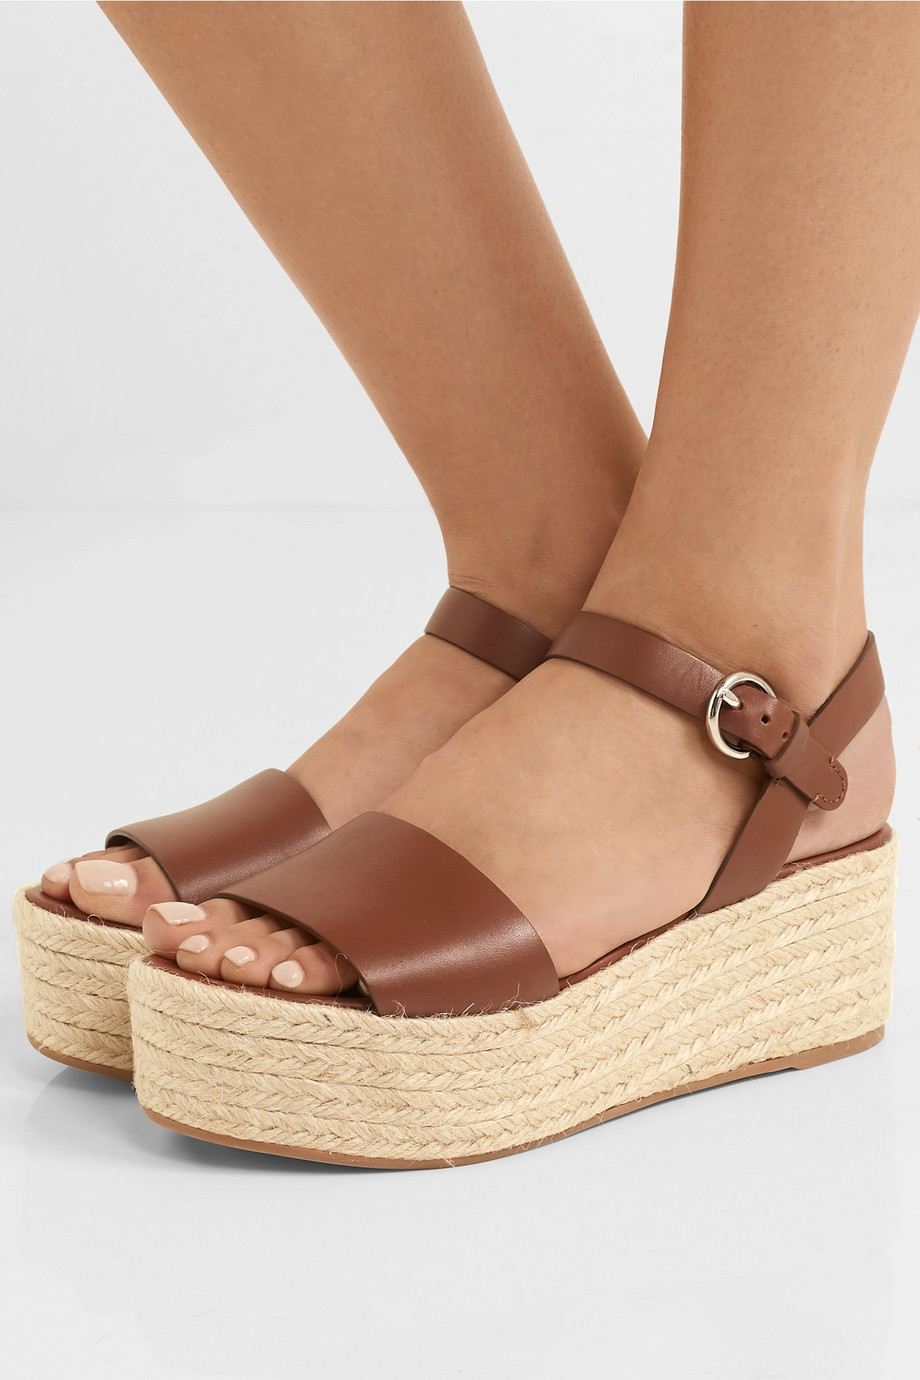 Prada Sandales plates-formes façon espadrilles en cuir